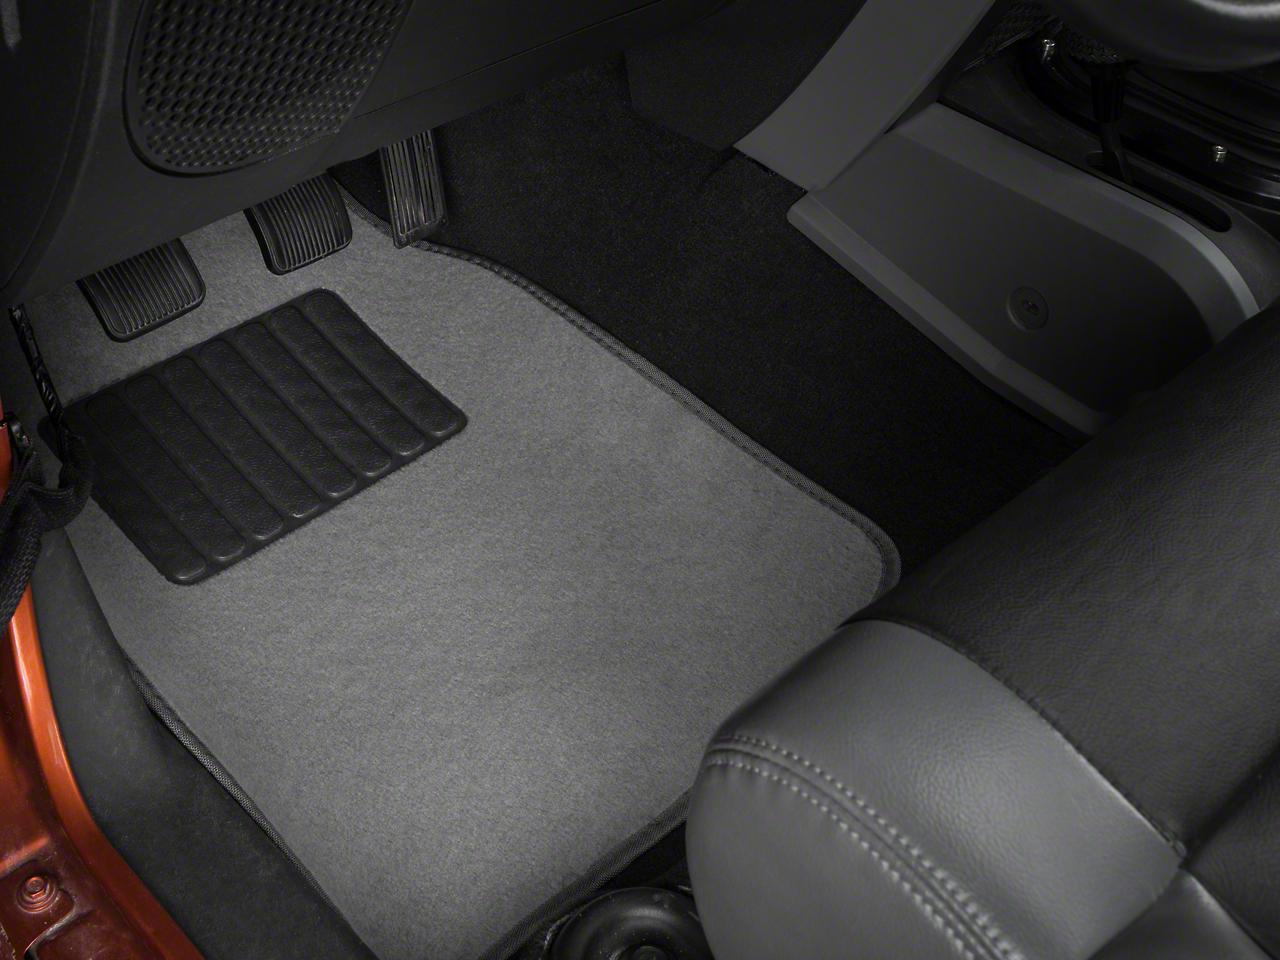 Alterum 4-Piece Fabric Floor Mat Set w/ Heel Pad- Gray (87-18 Jeep Wrangler YJ, TJ, JK & JL)